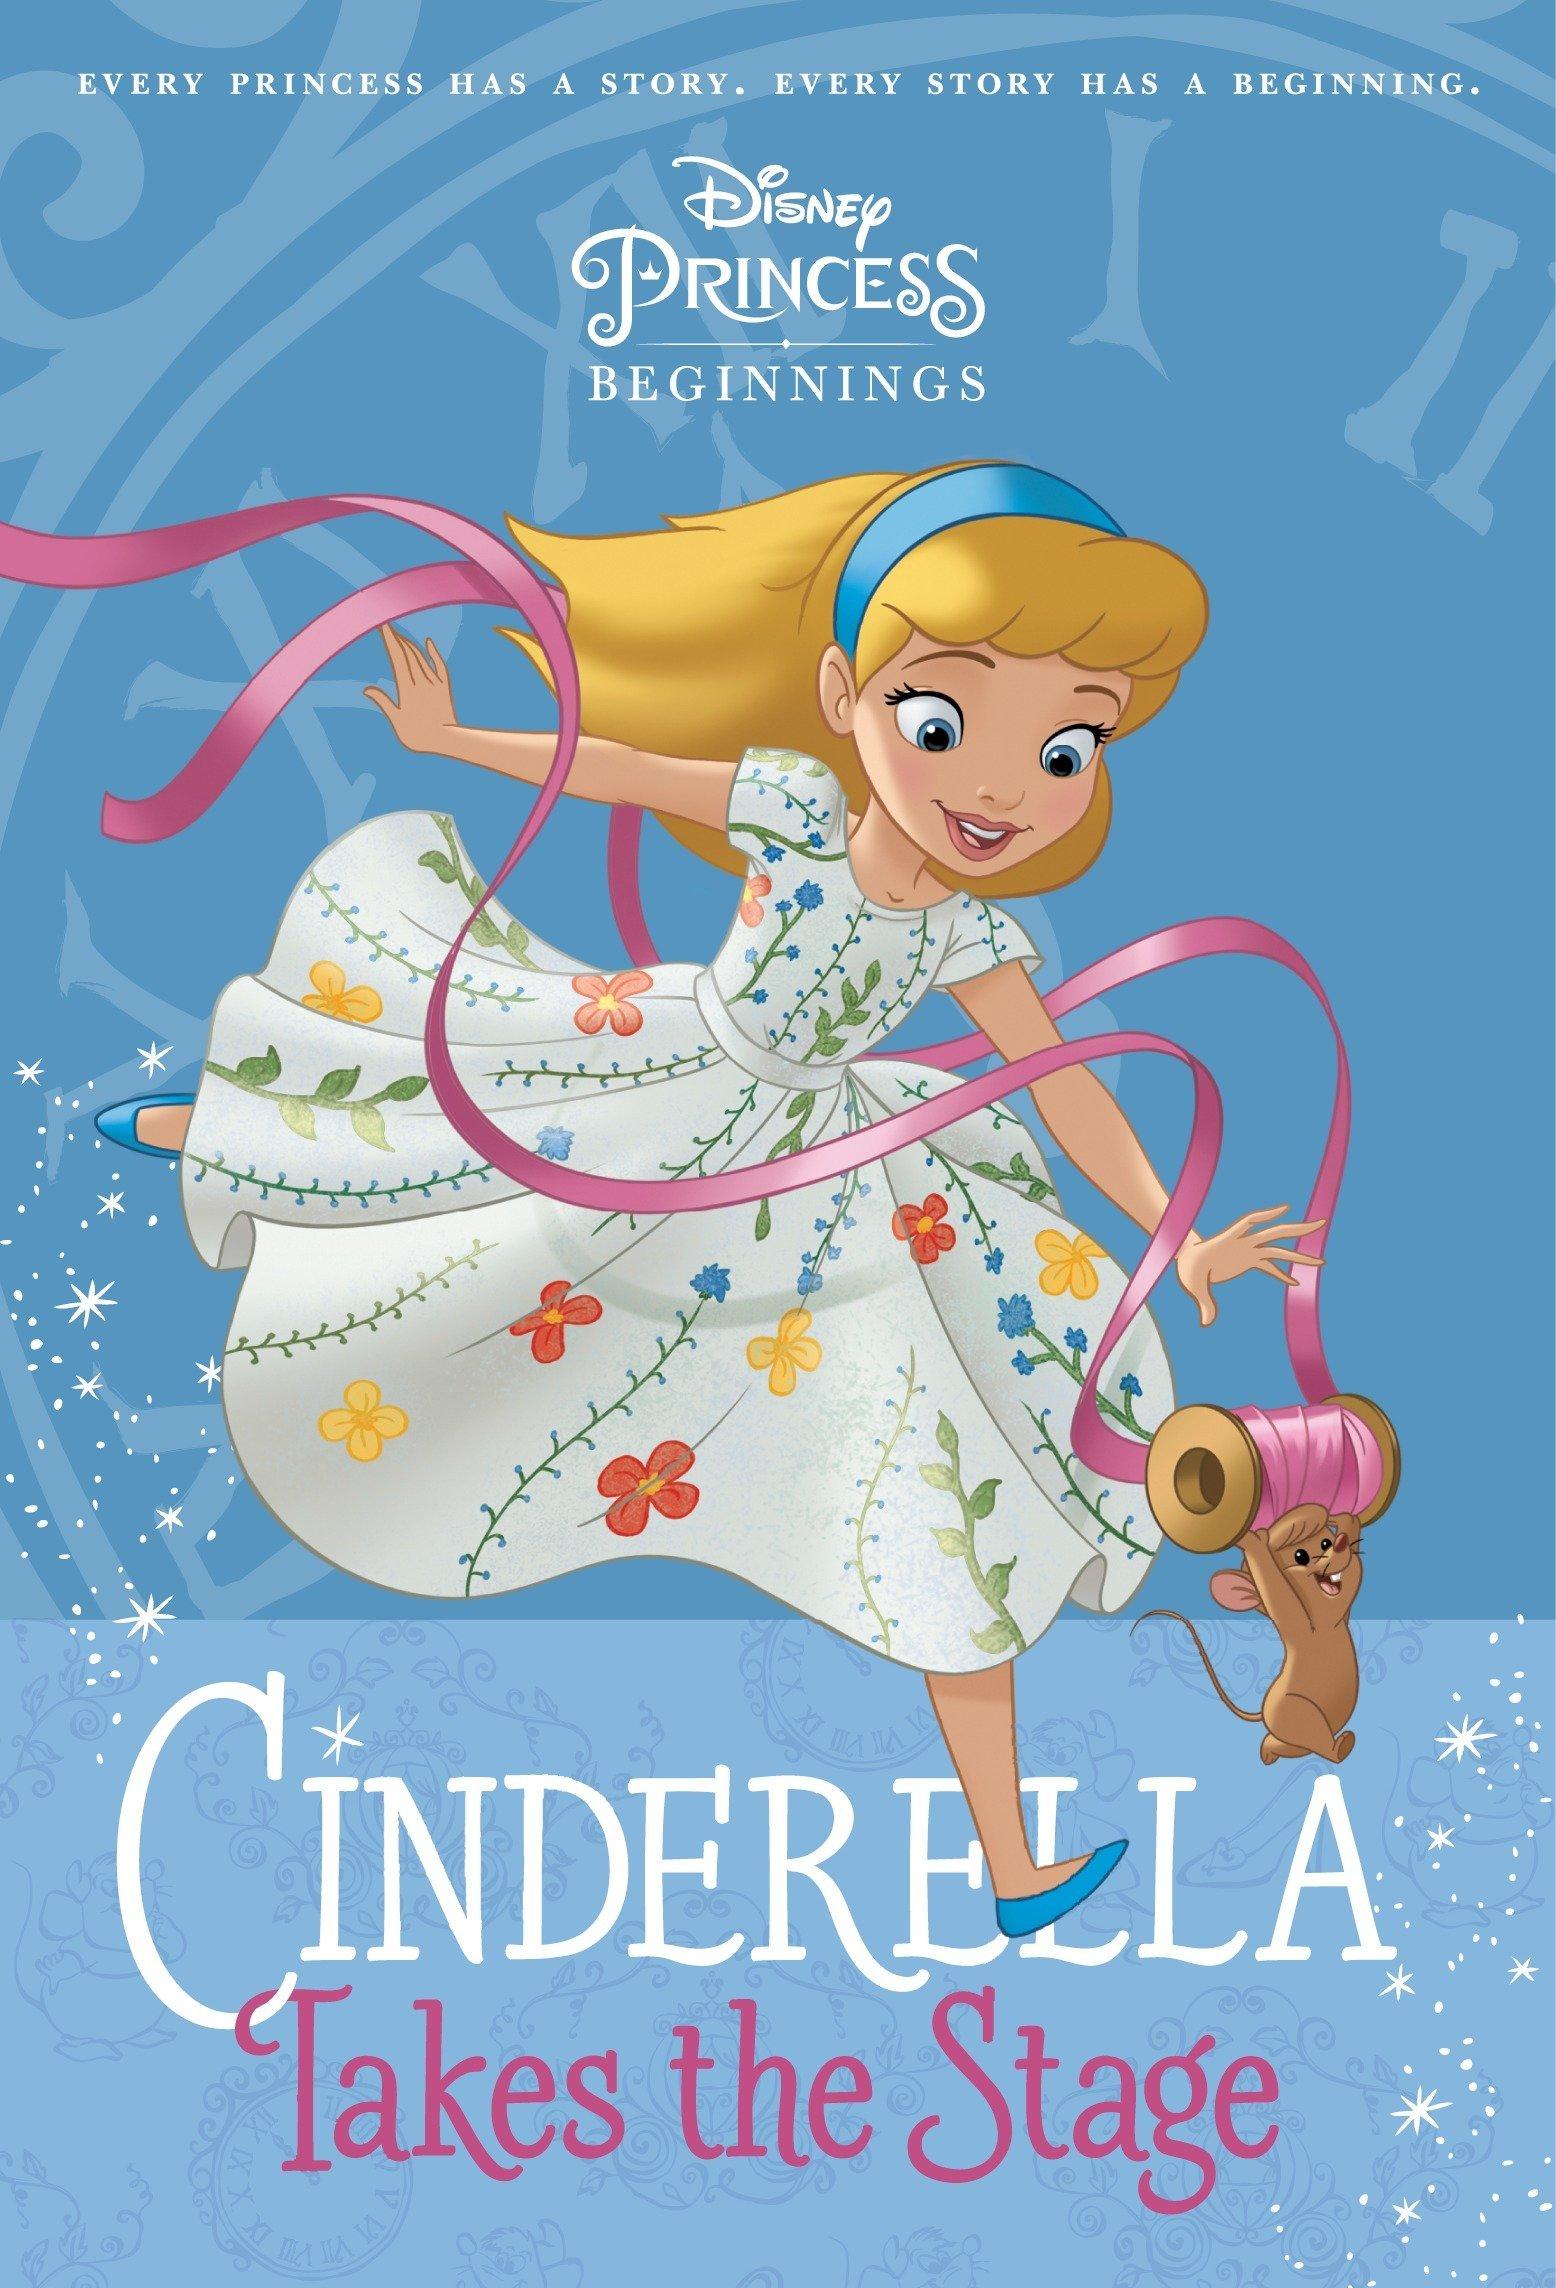 Amazon Com Disney Princess Beginnings Cinderella Takes The Stage